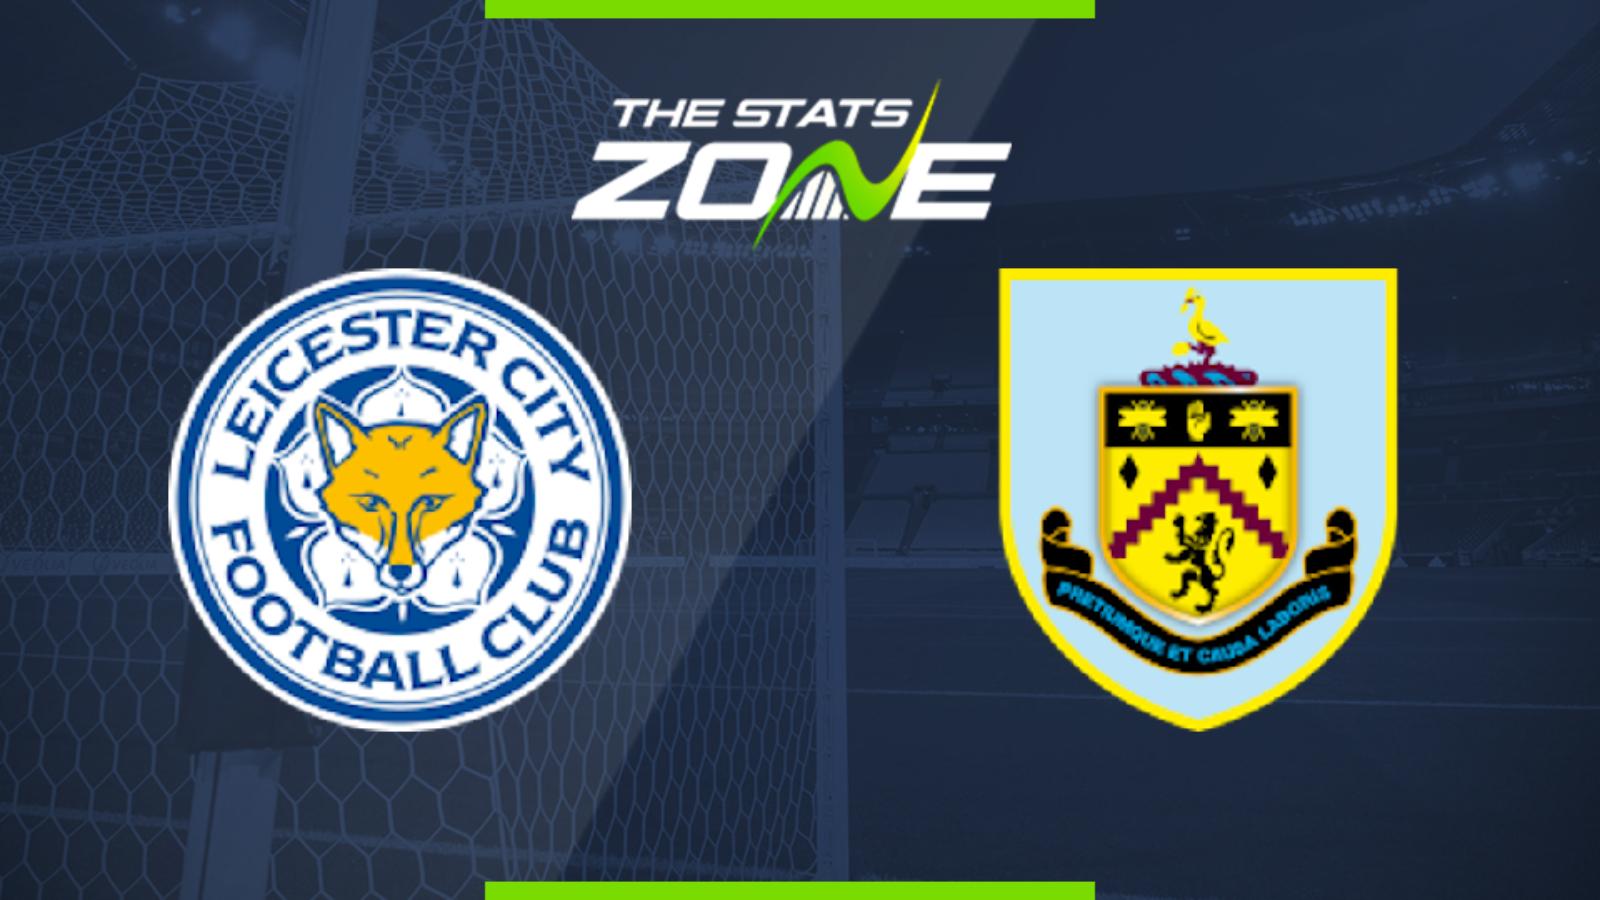 2019 20 Premier League Leicester Vs Burnley Preview Prediction The Stats Zone